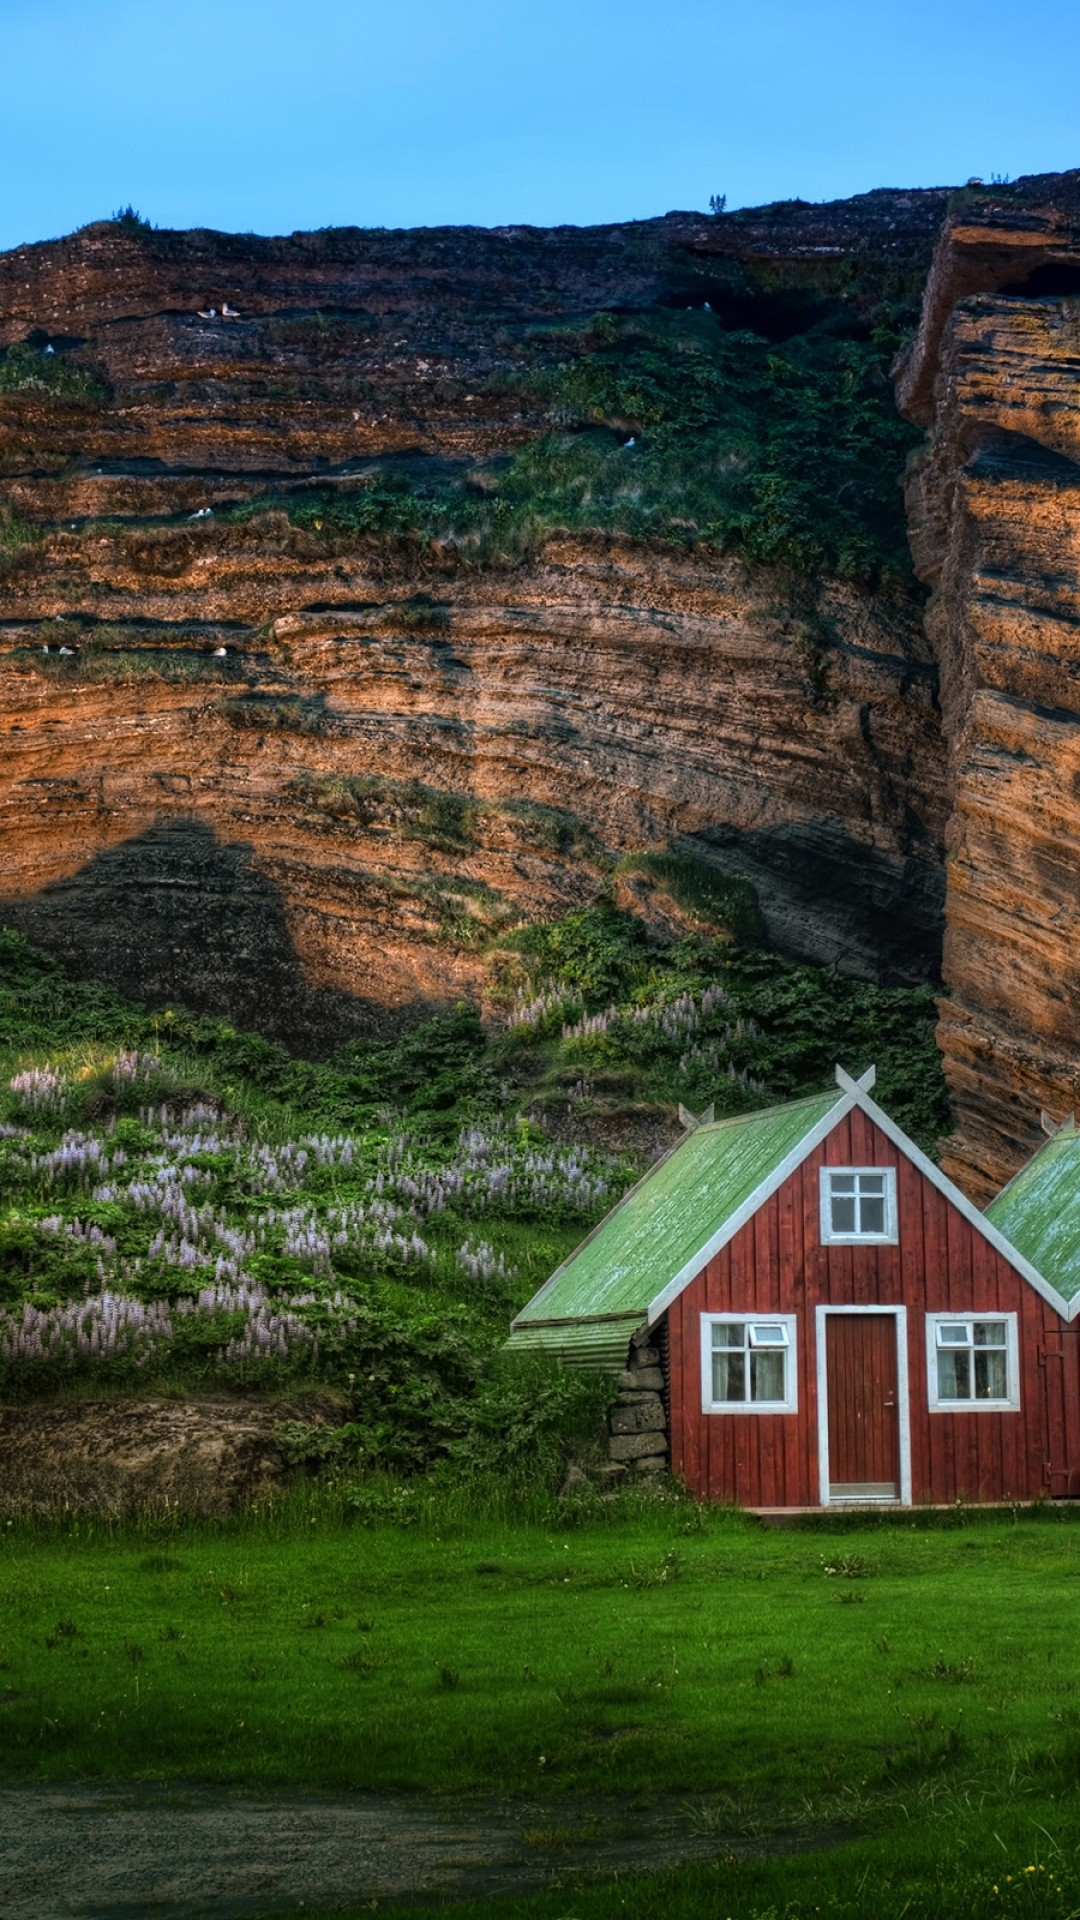 Iceland hd wallpaper for mobile